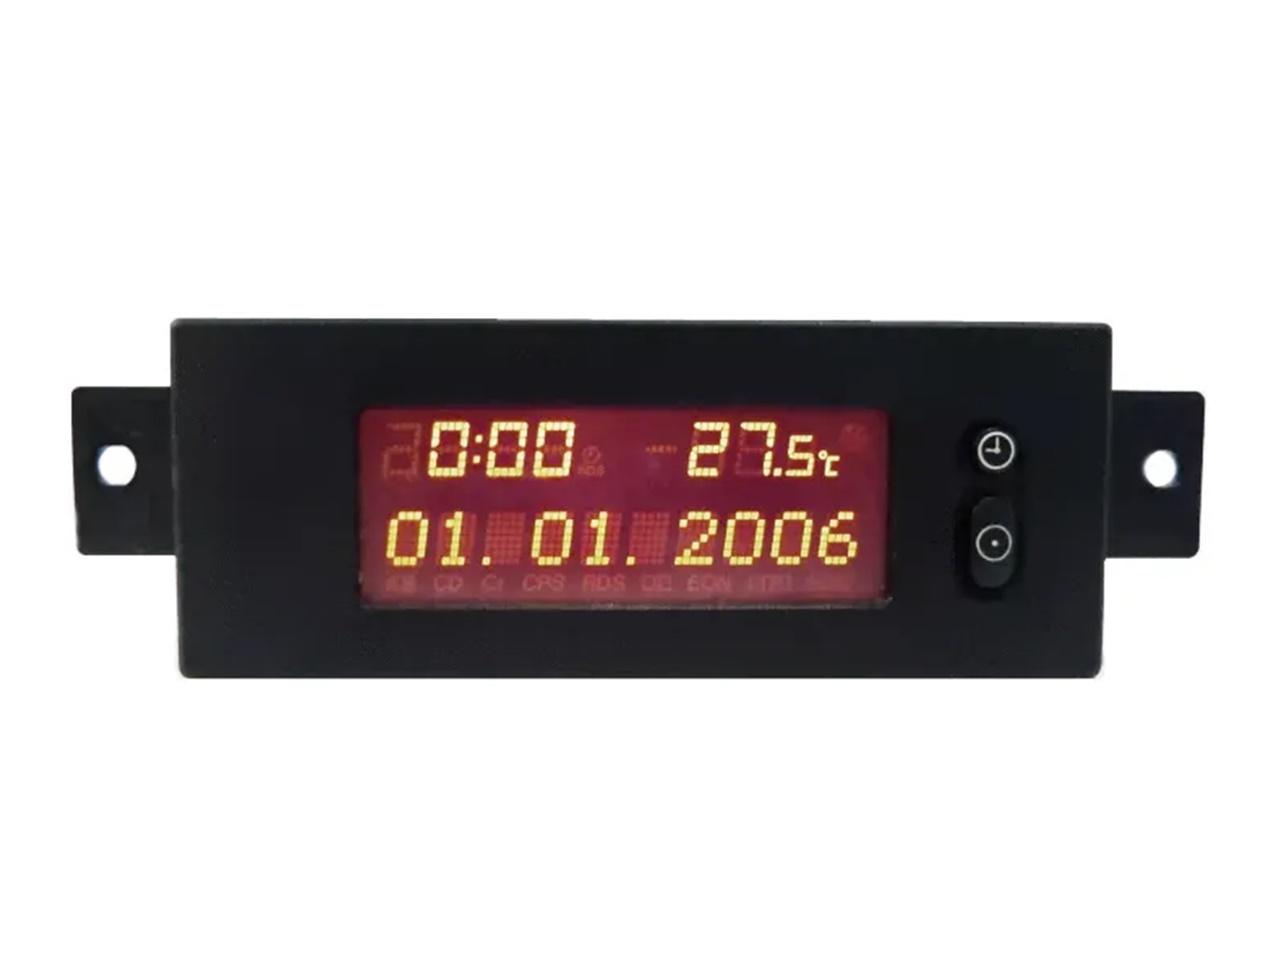 Tid Visor Relogio Digital do Painel Marcador de Hora Data Temperatura a2c53141118 093353585 Gm Vectra 06 07 08 09 010 011 Astra 99 00 01 02 03 04 05 06 07 08 09 010 011 012